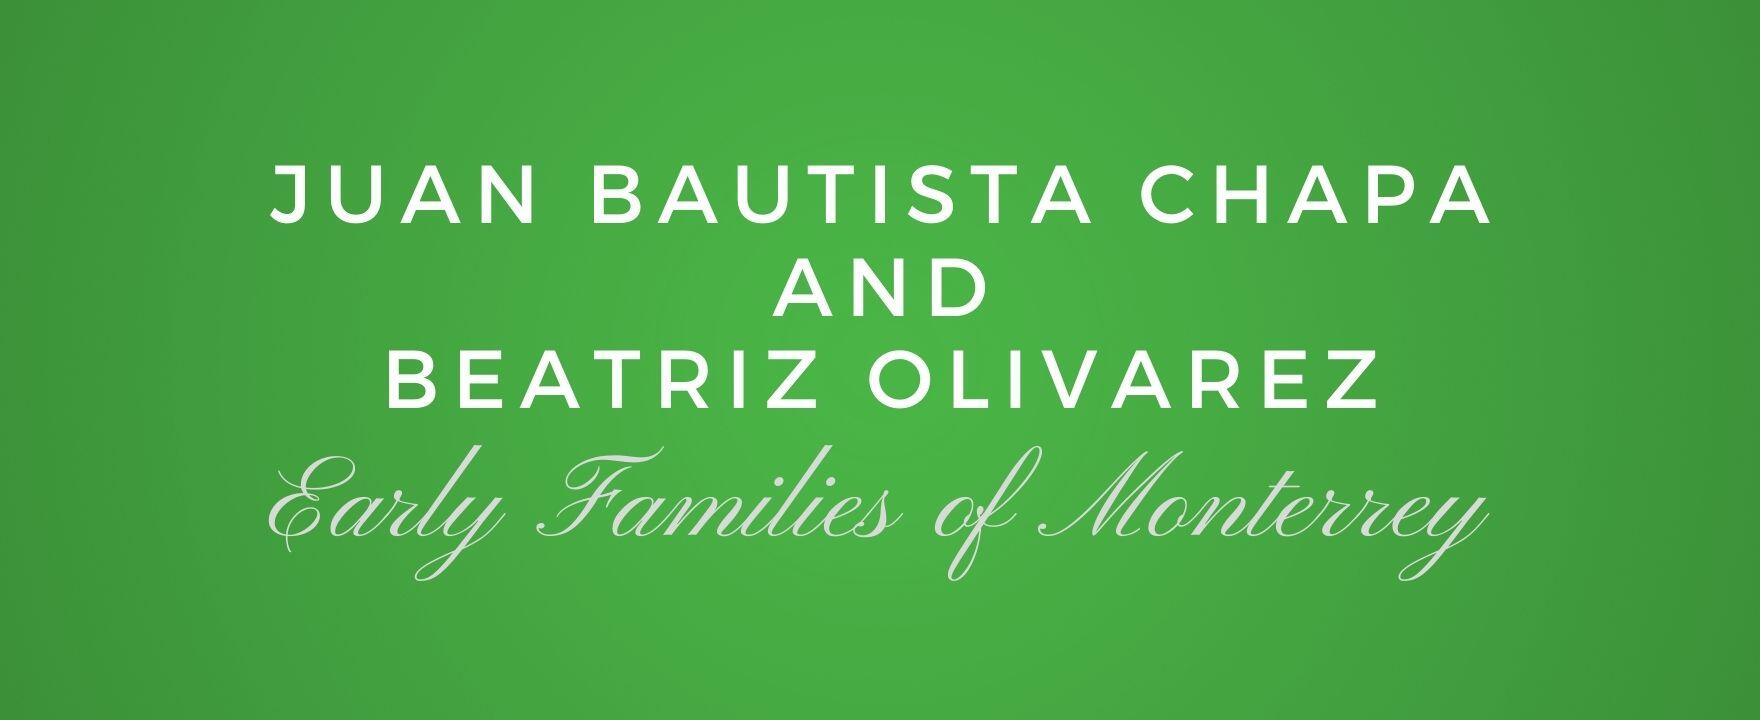 Juan Bautista Chapa and Beatriz Olivarez